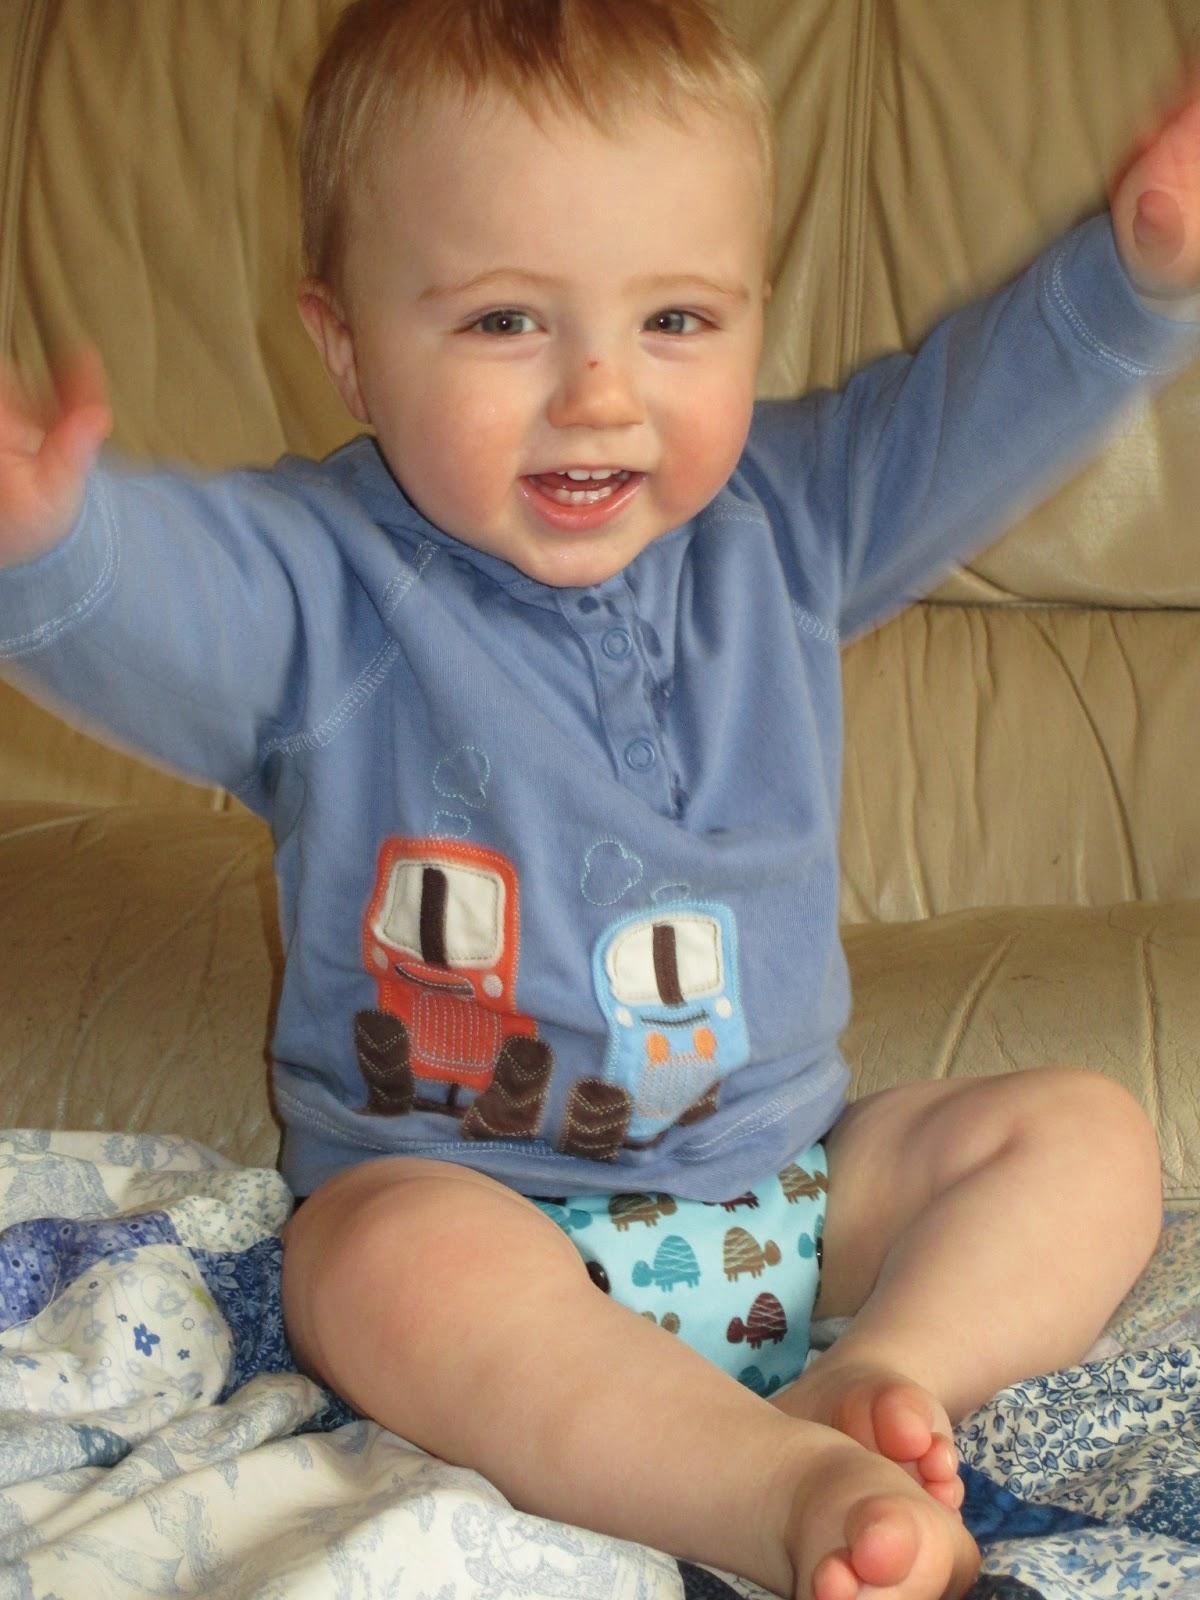 Oscar sporting his Frugi top!